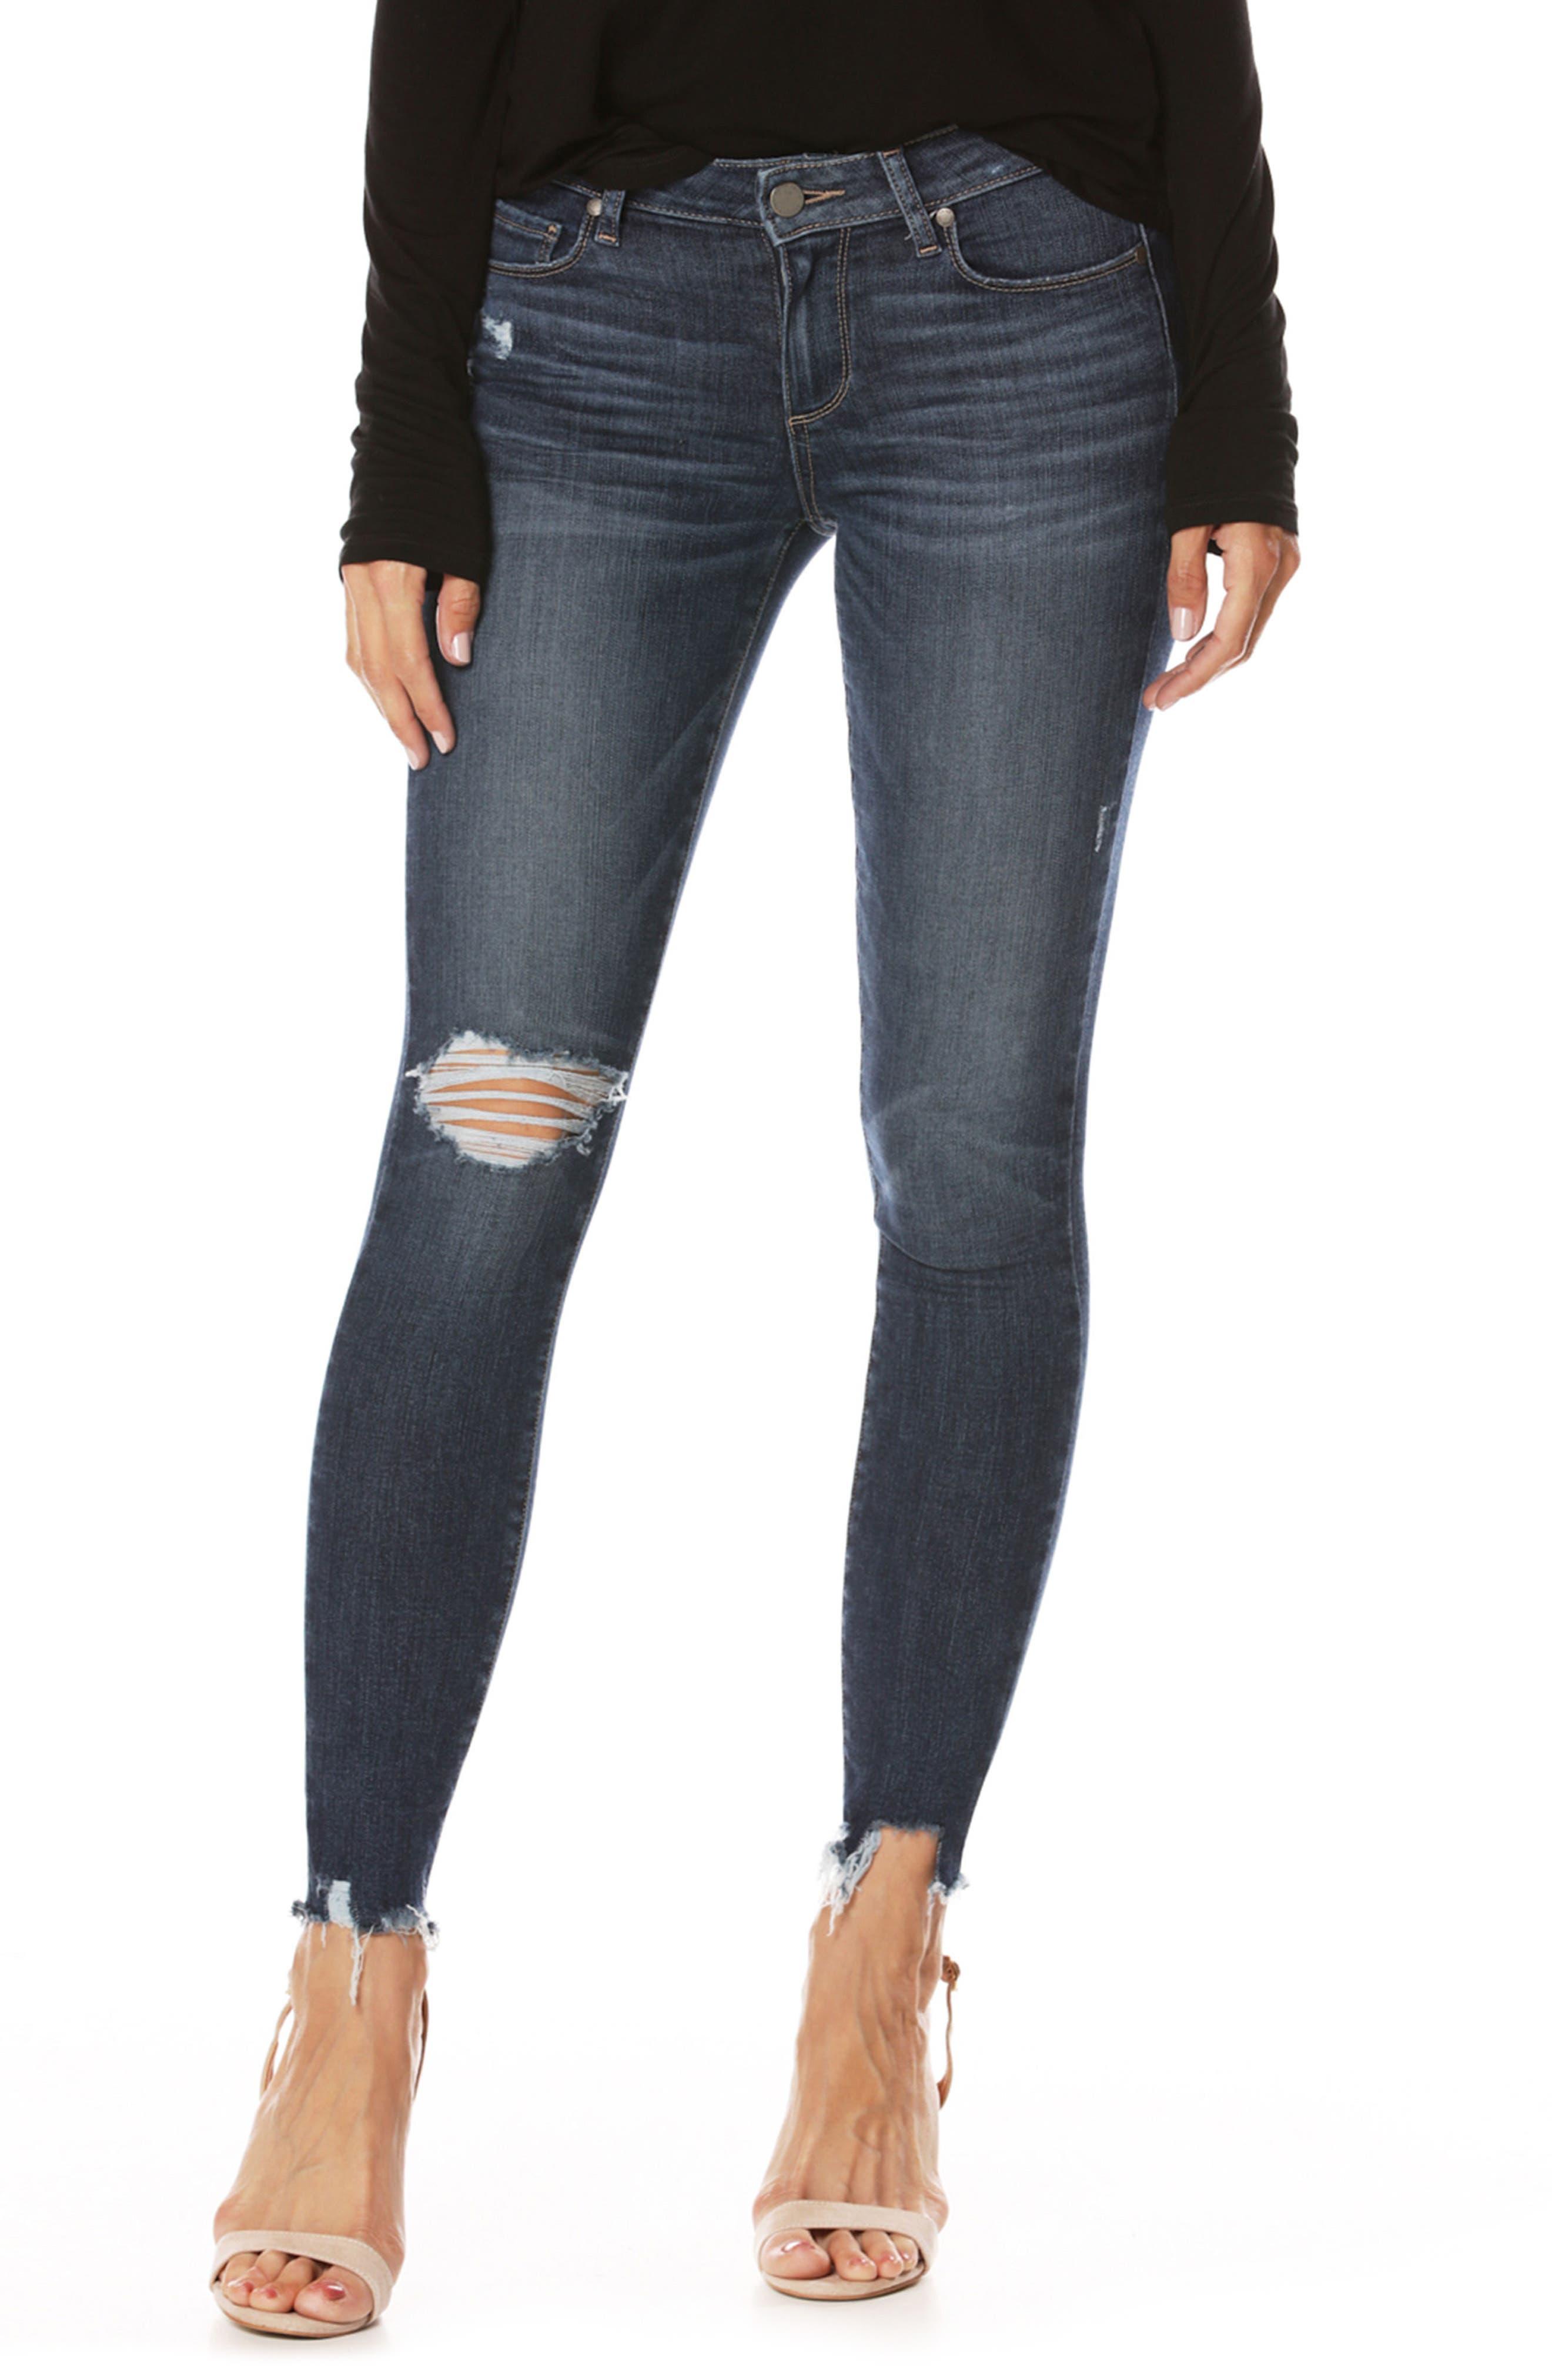 Transcend Vintage - Verdugo Ankle Skinny Jeans,                             Main thumbnail 1, color,                             400